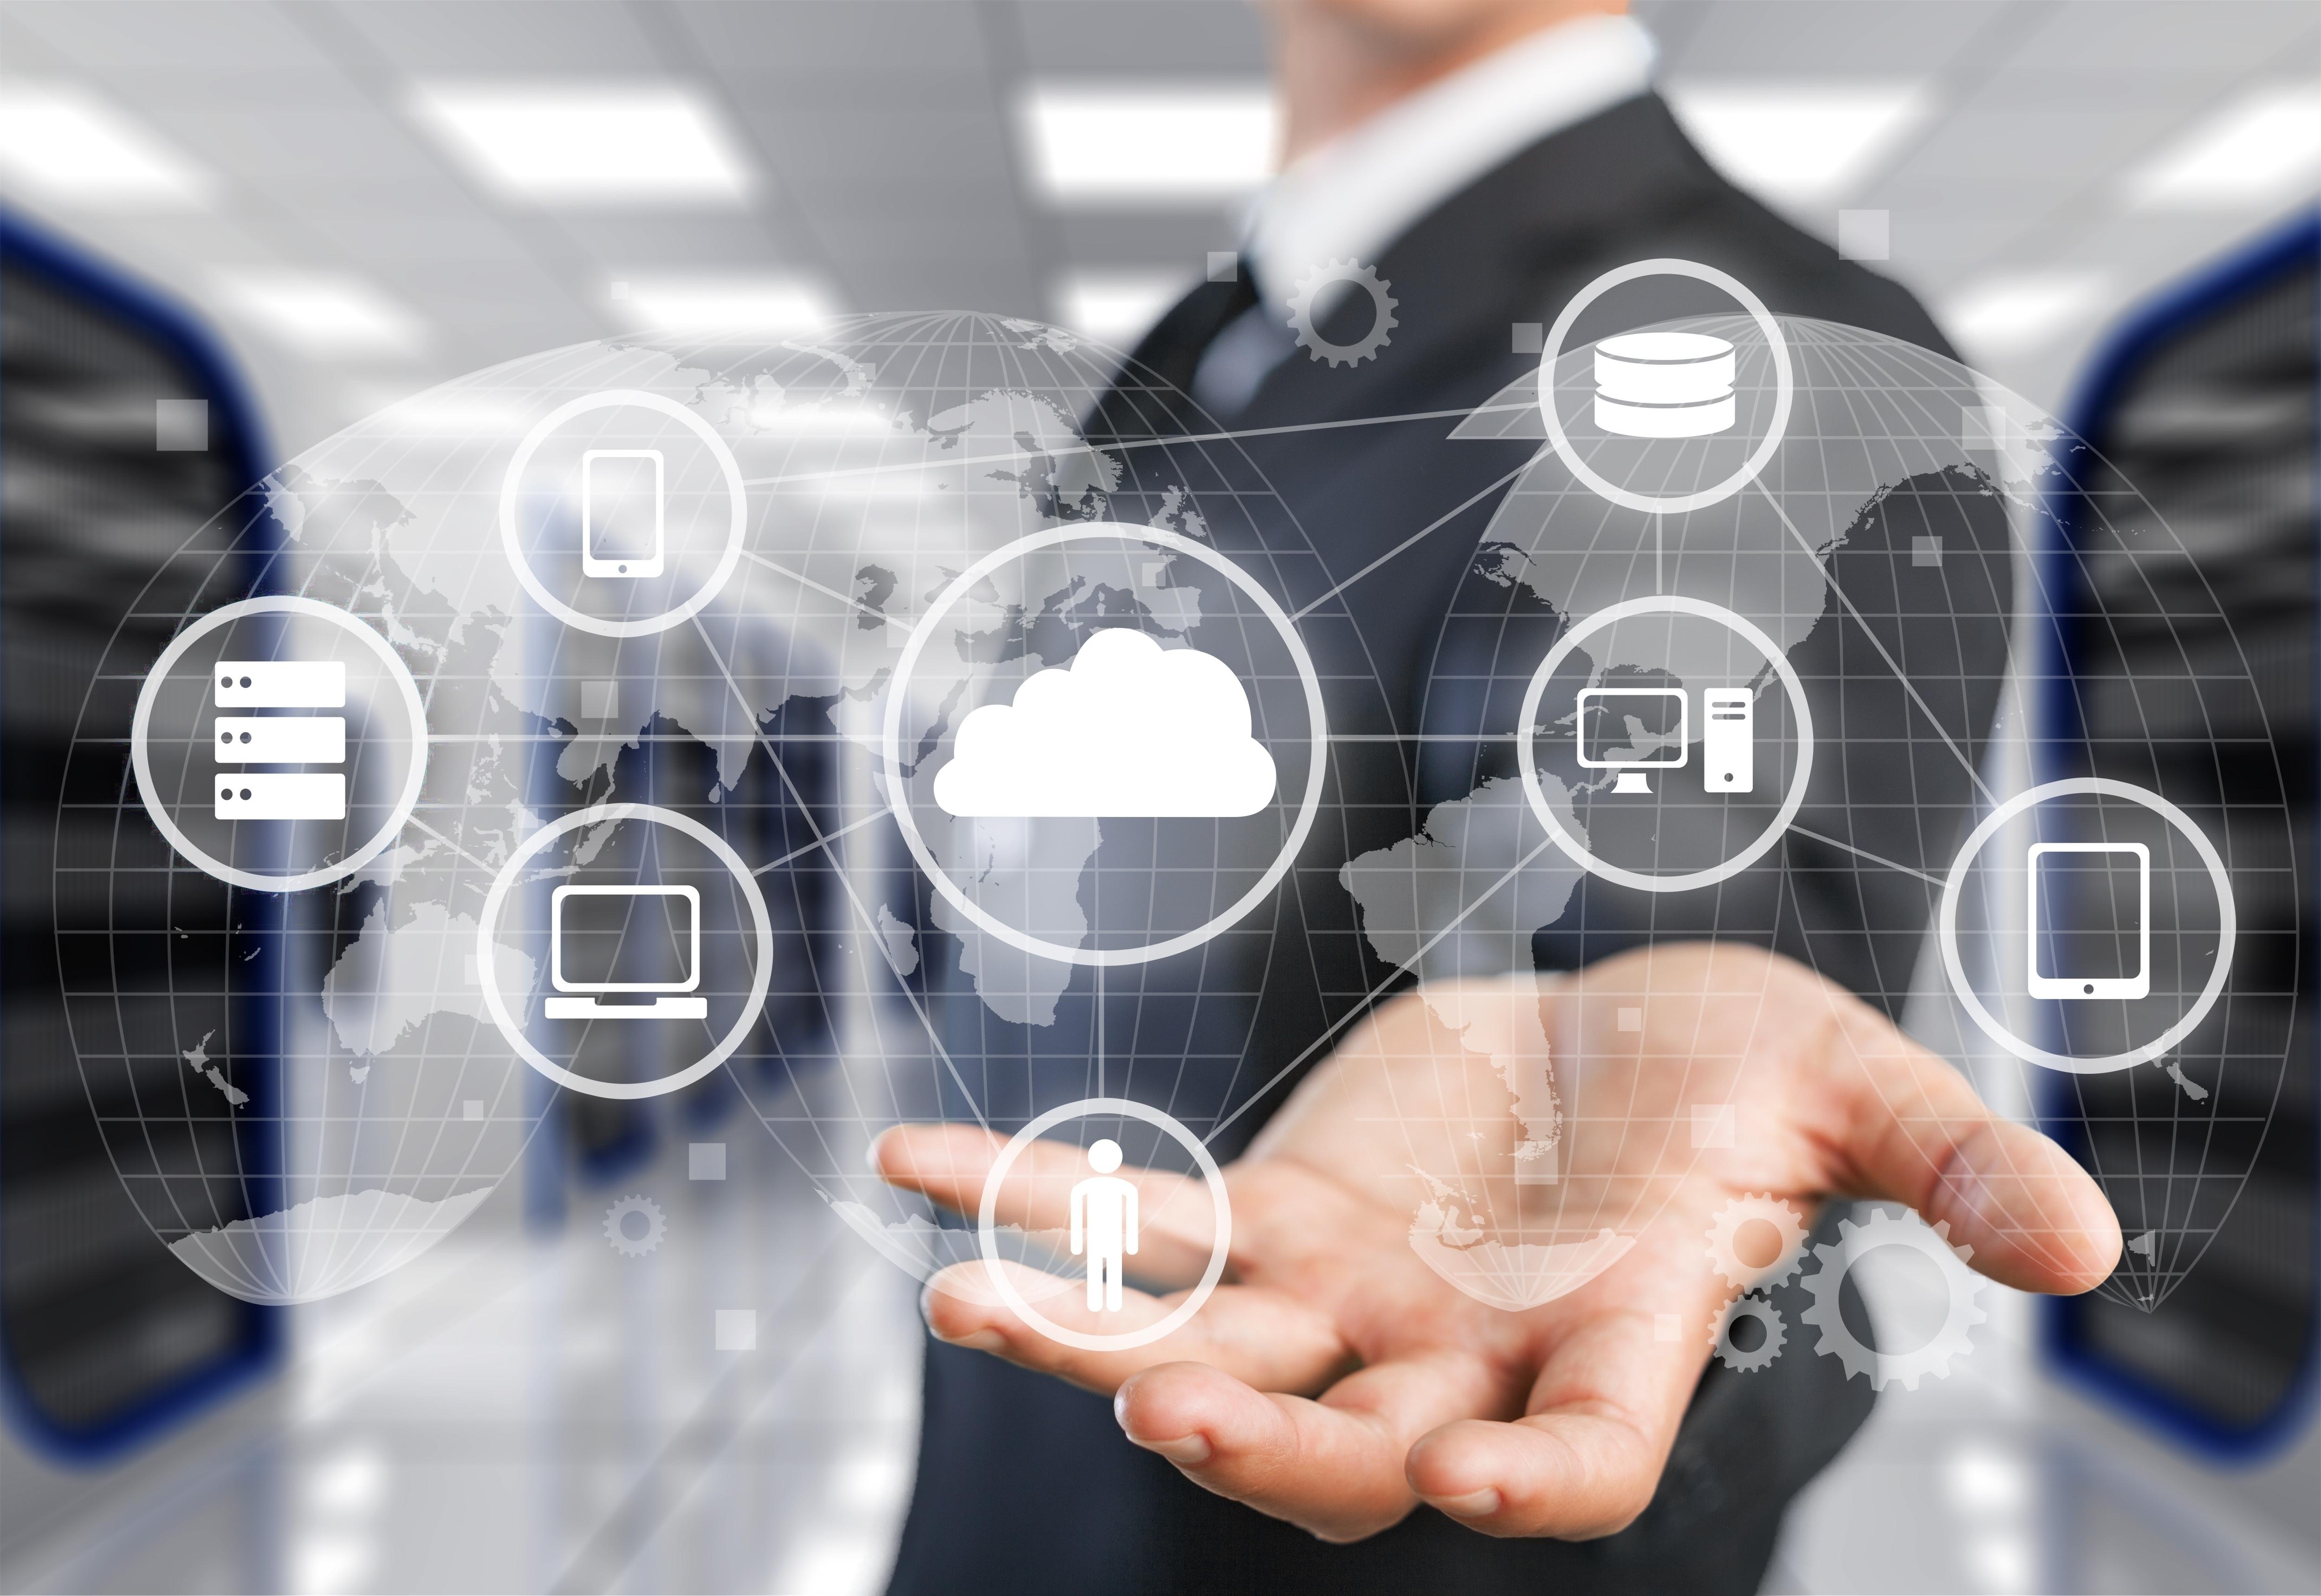 Advantages-of-Cloud-Computing-5-Benefits.jpg (5000×3439)